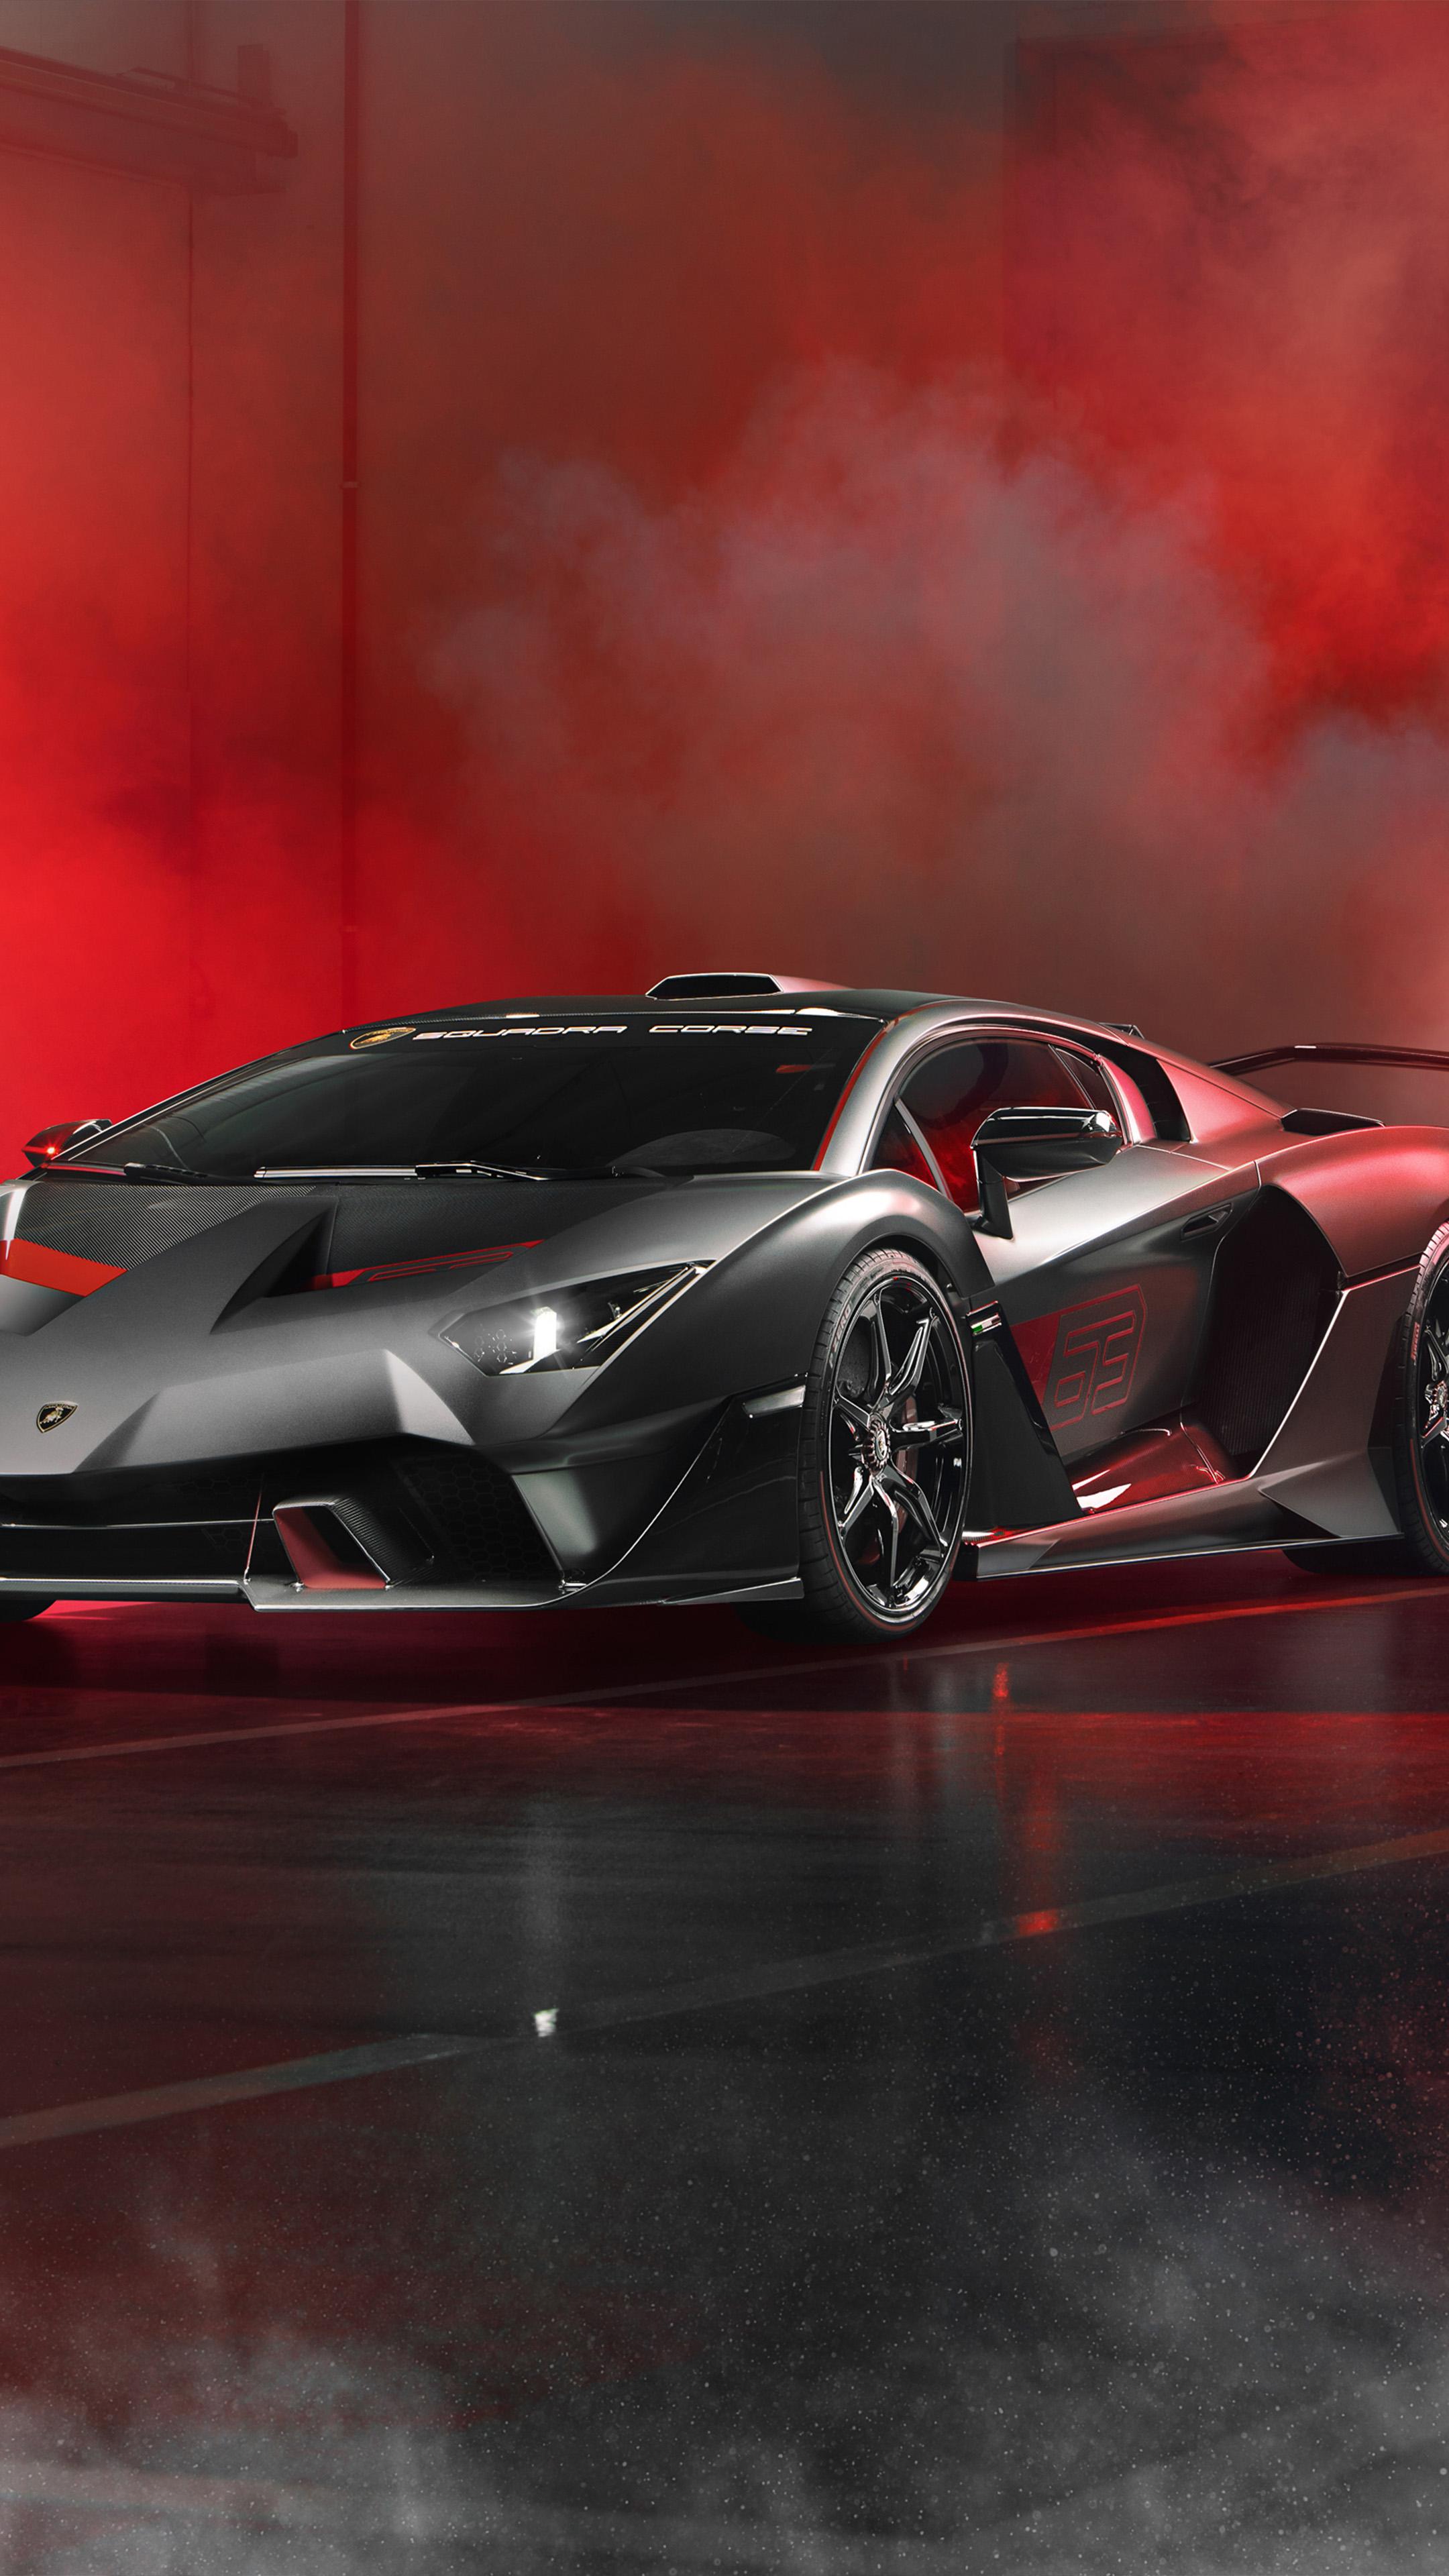 Siege Girls Anime Wallpaper Download Lamborghini Sc18 Hyper Car 2019 Free Pure 4k